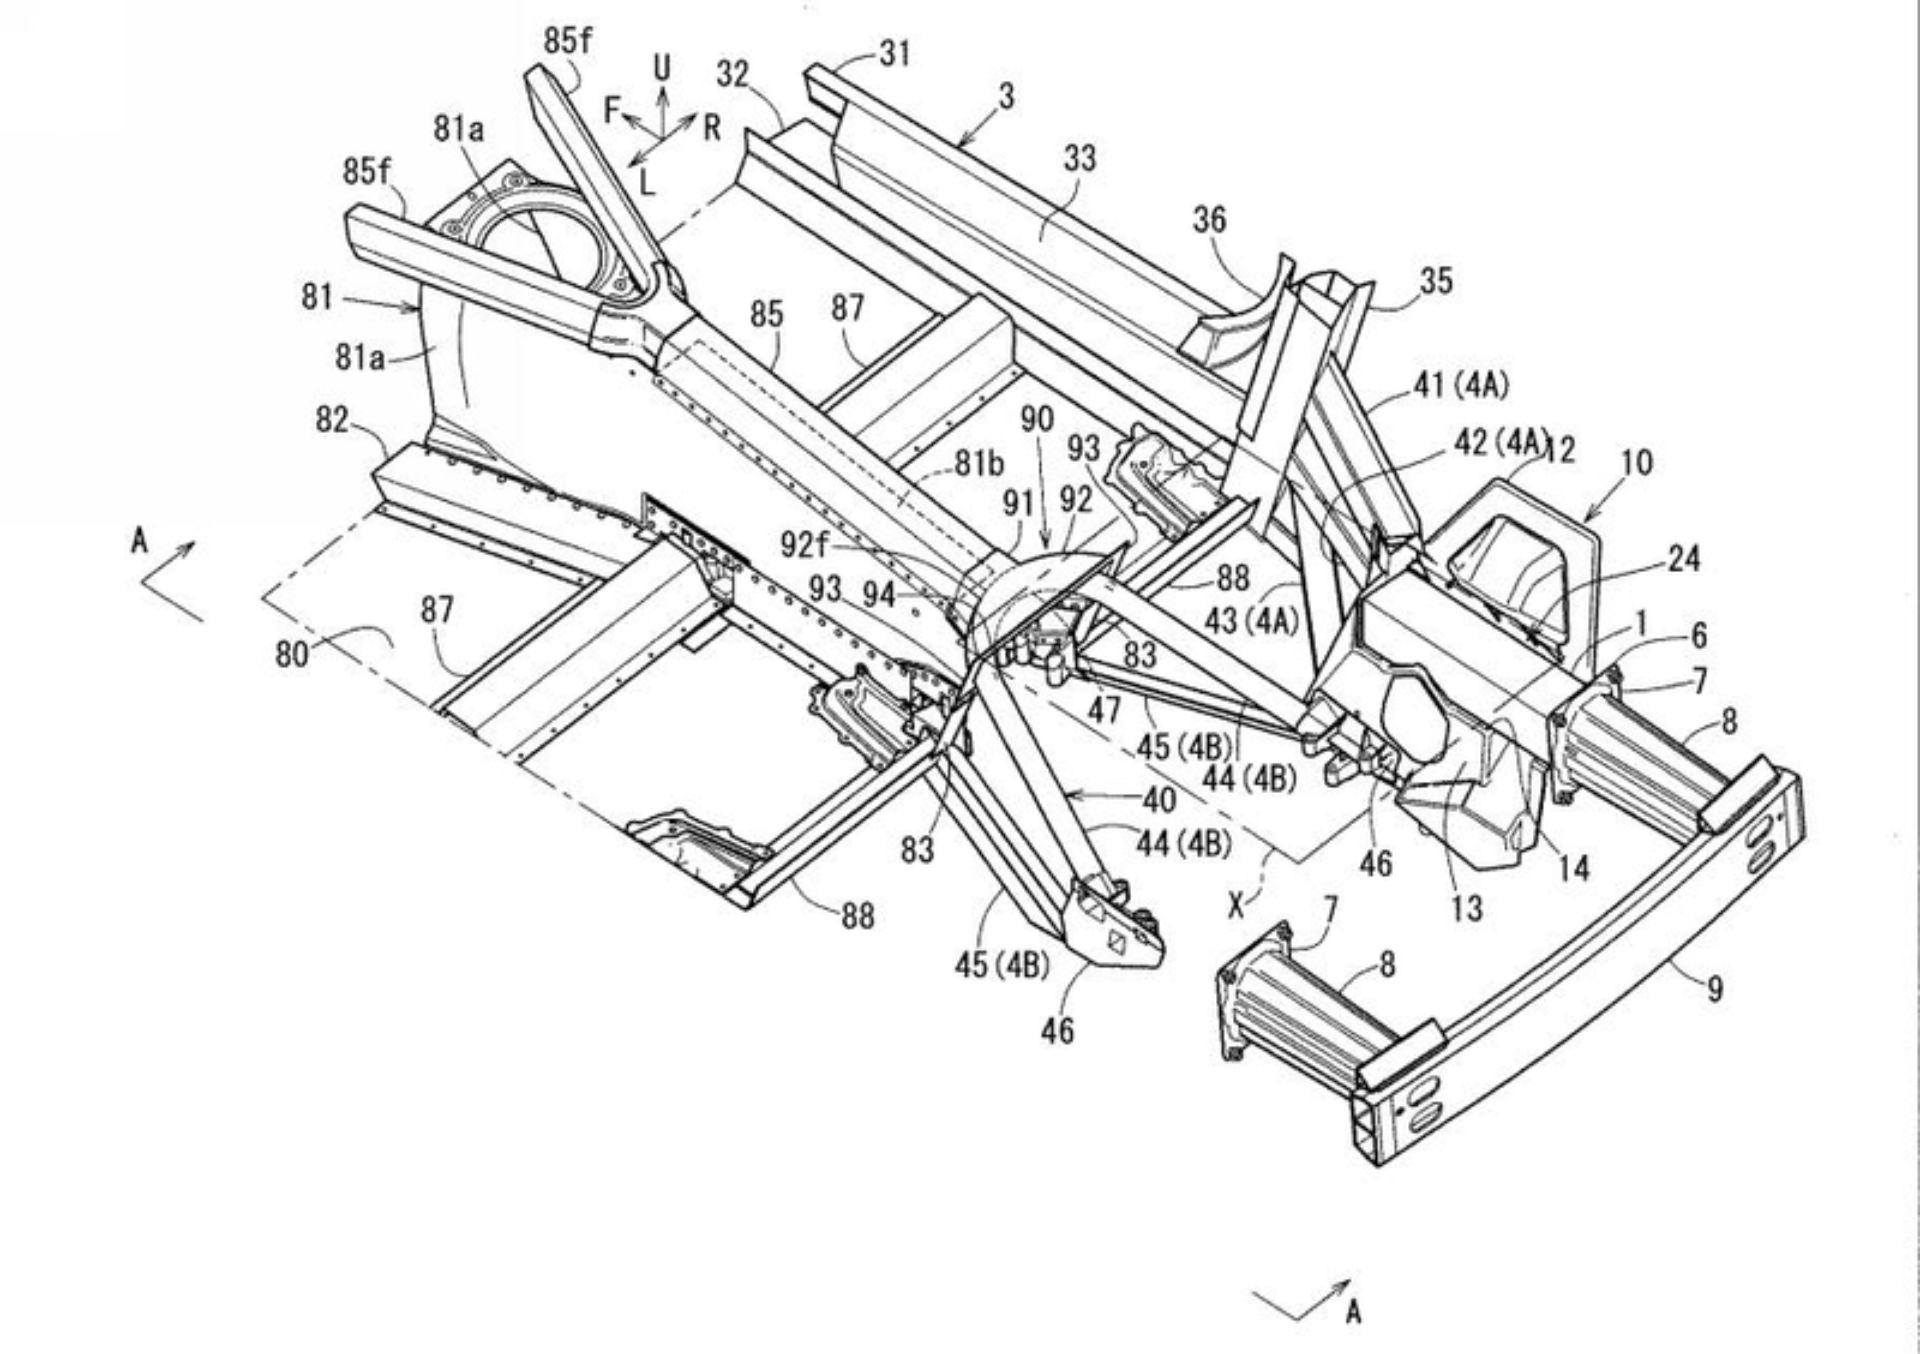 Mazda-Structure-patent-filing-9